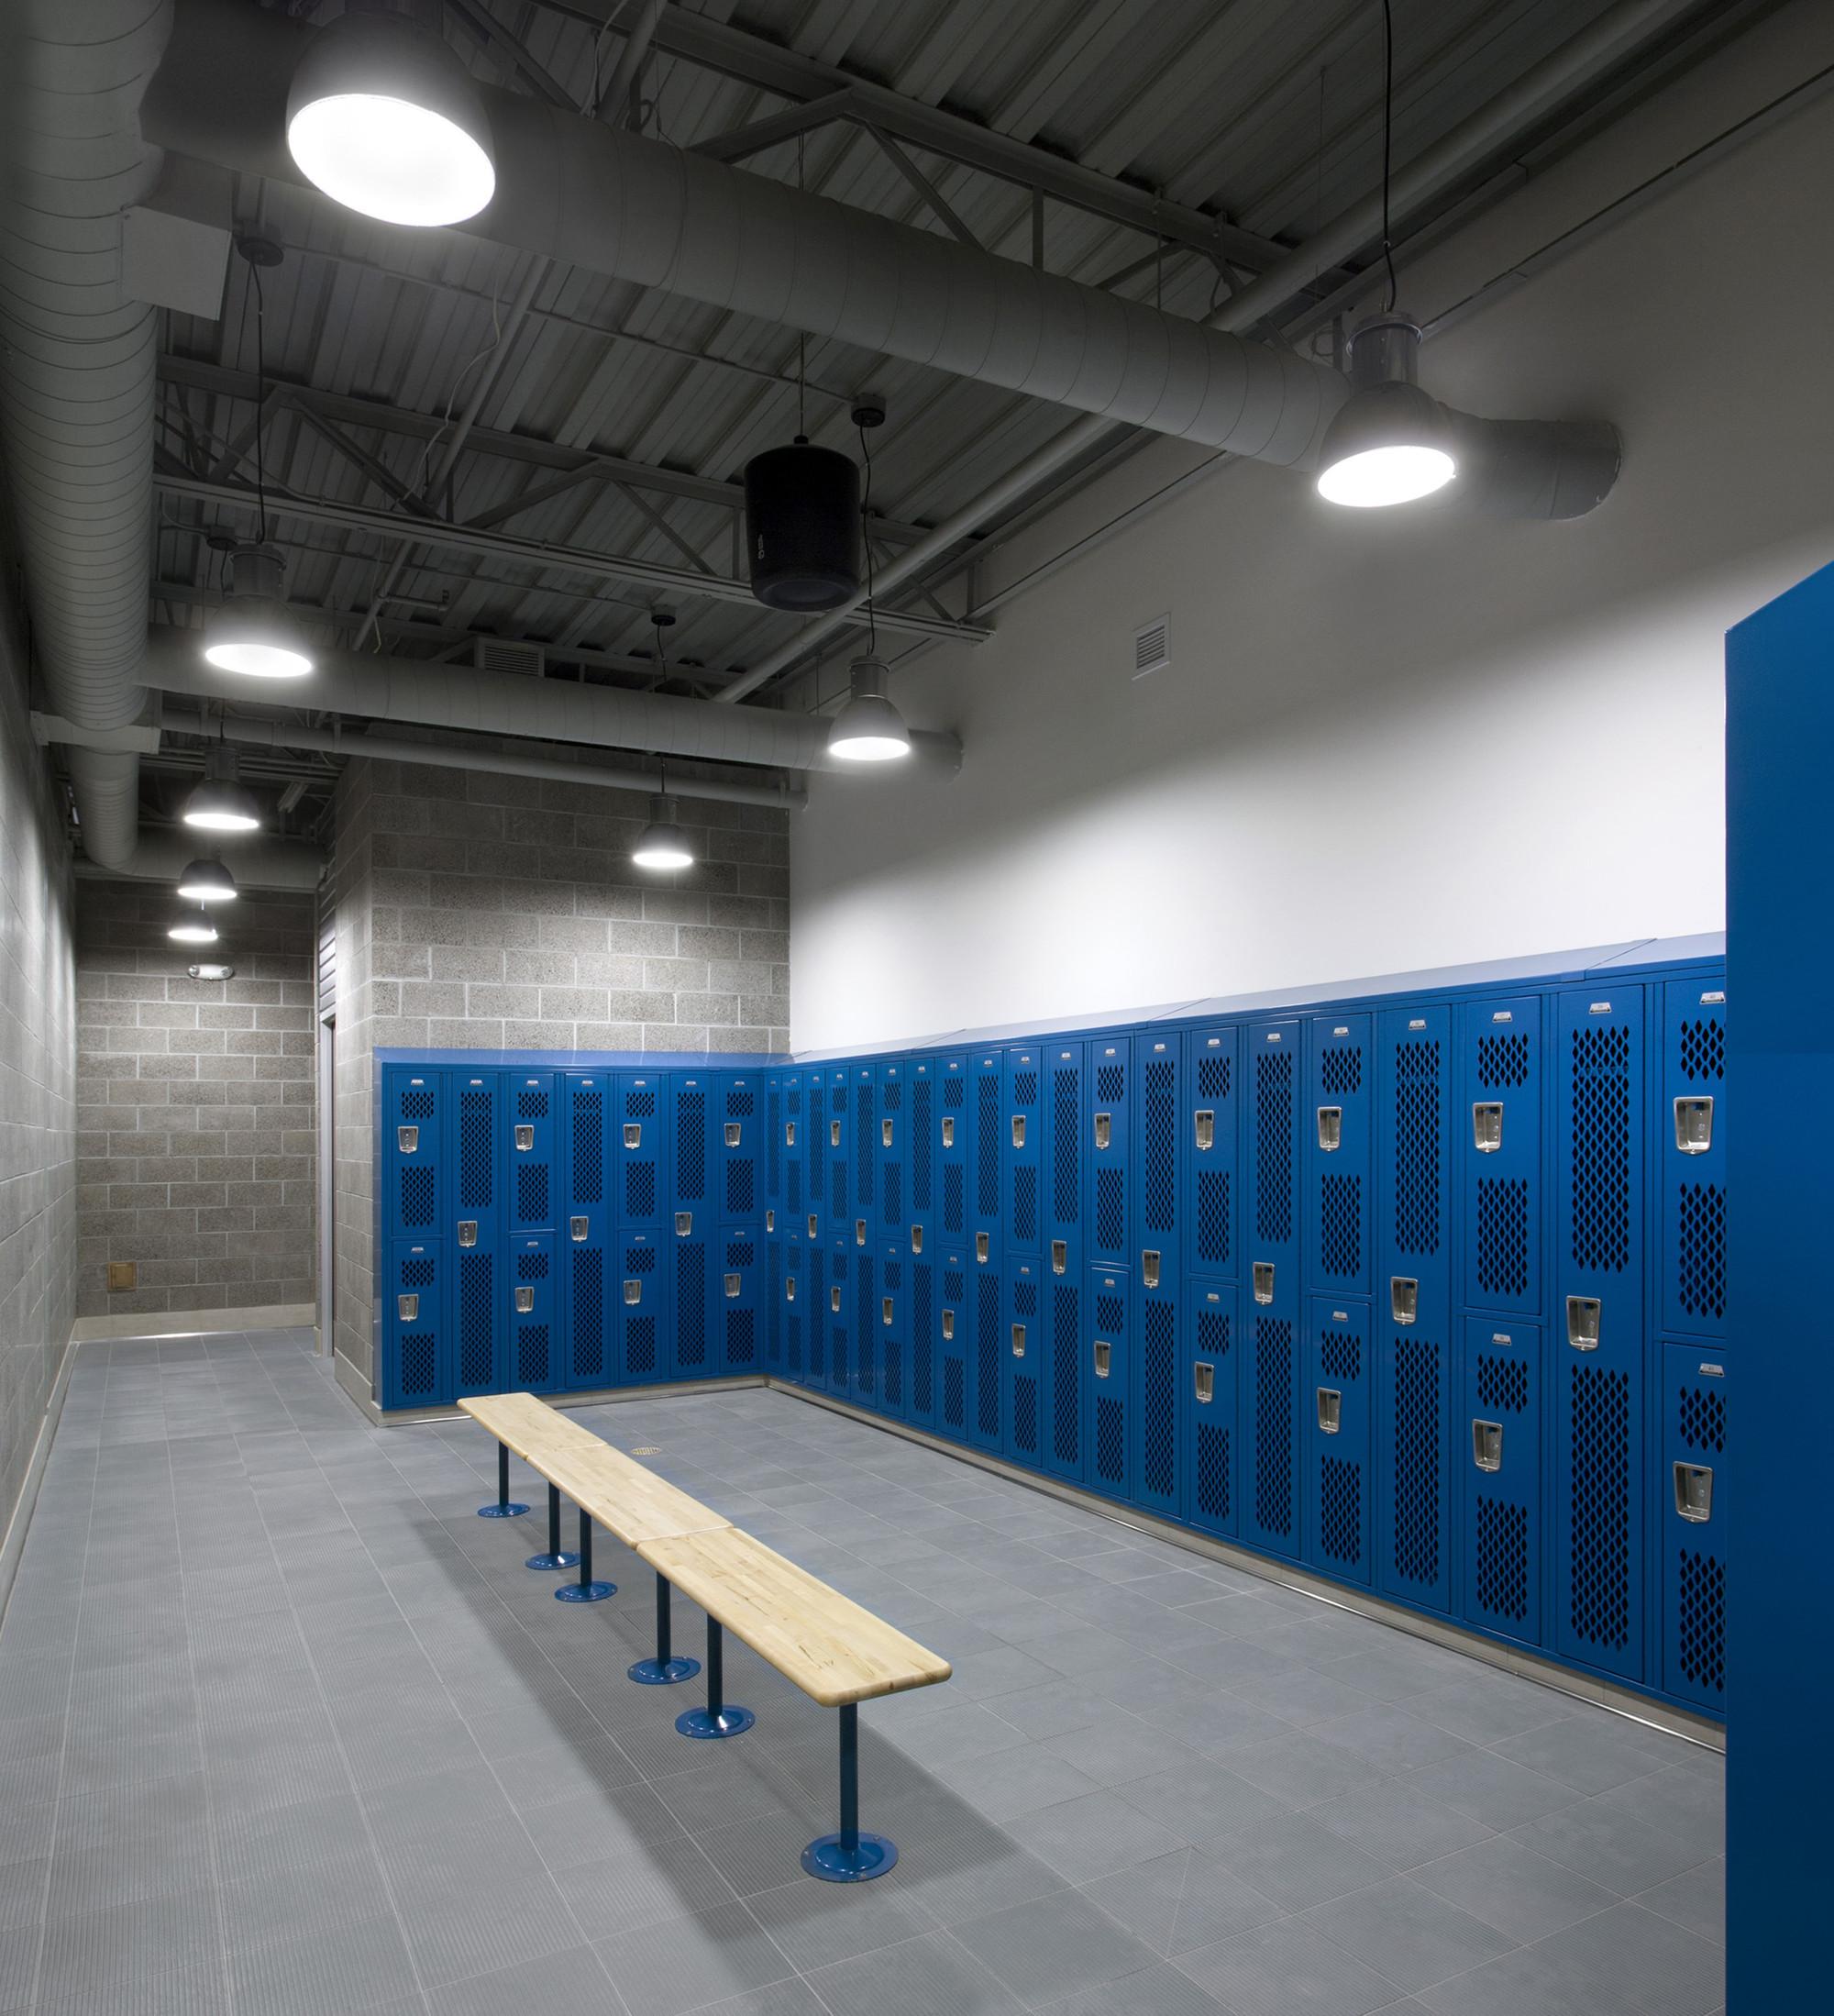 Дизайн спортивного комплекса: раздевалка